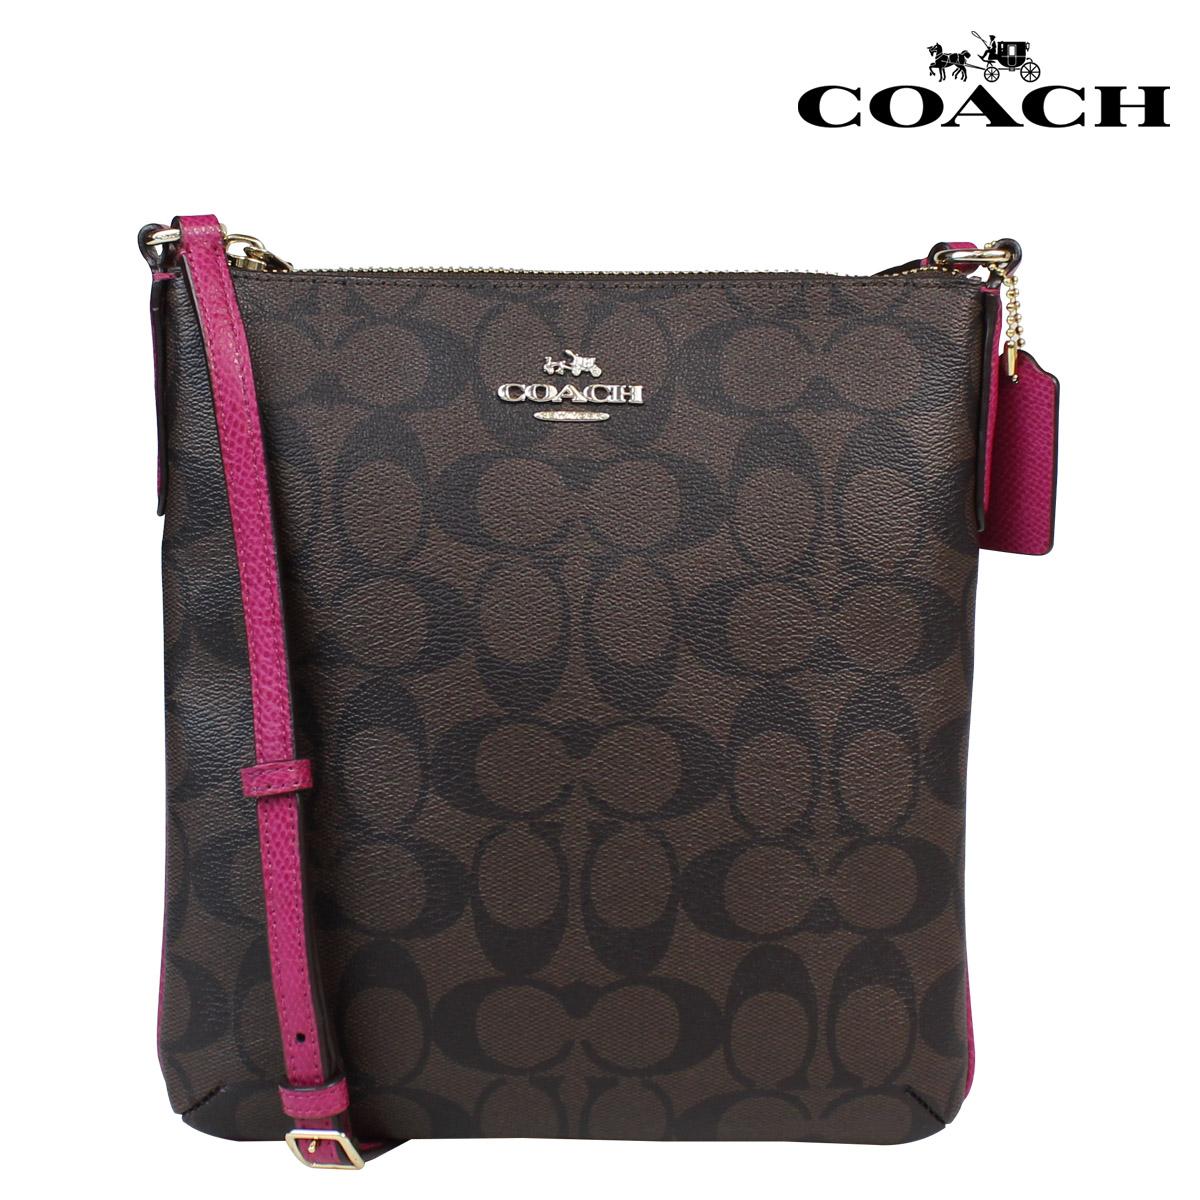 Coach COACH women's shoulder bag F35940 Brown x Cranberry signature NS  cross body [12 /